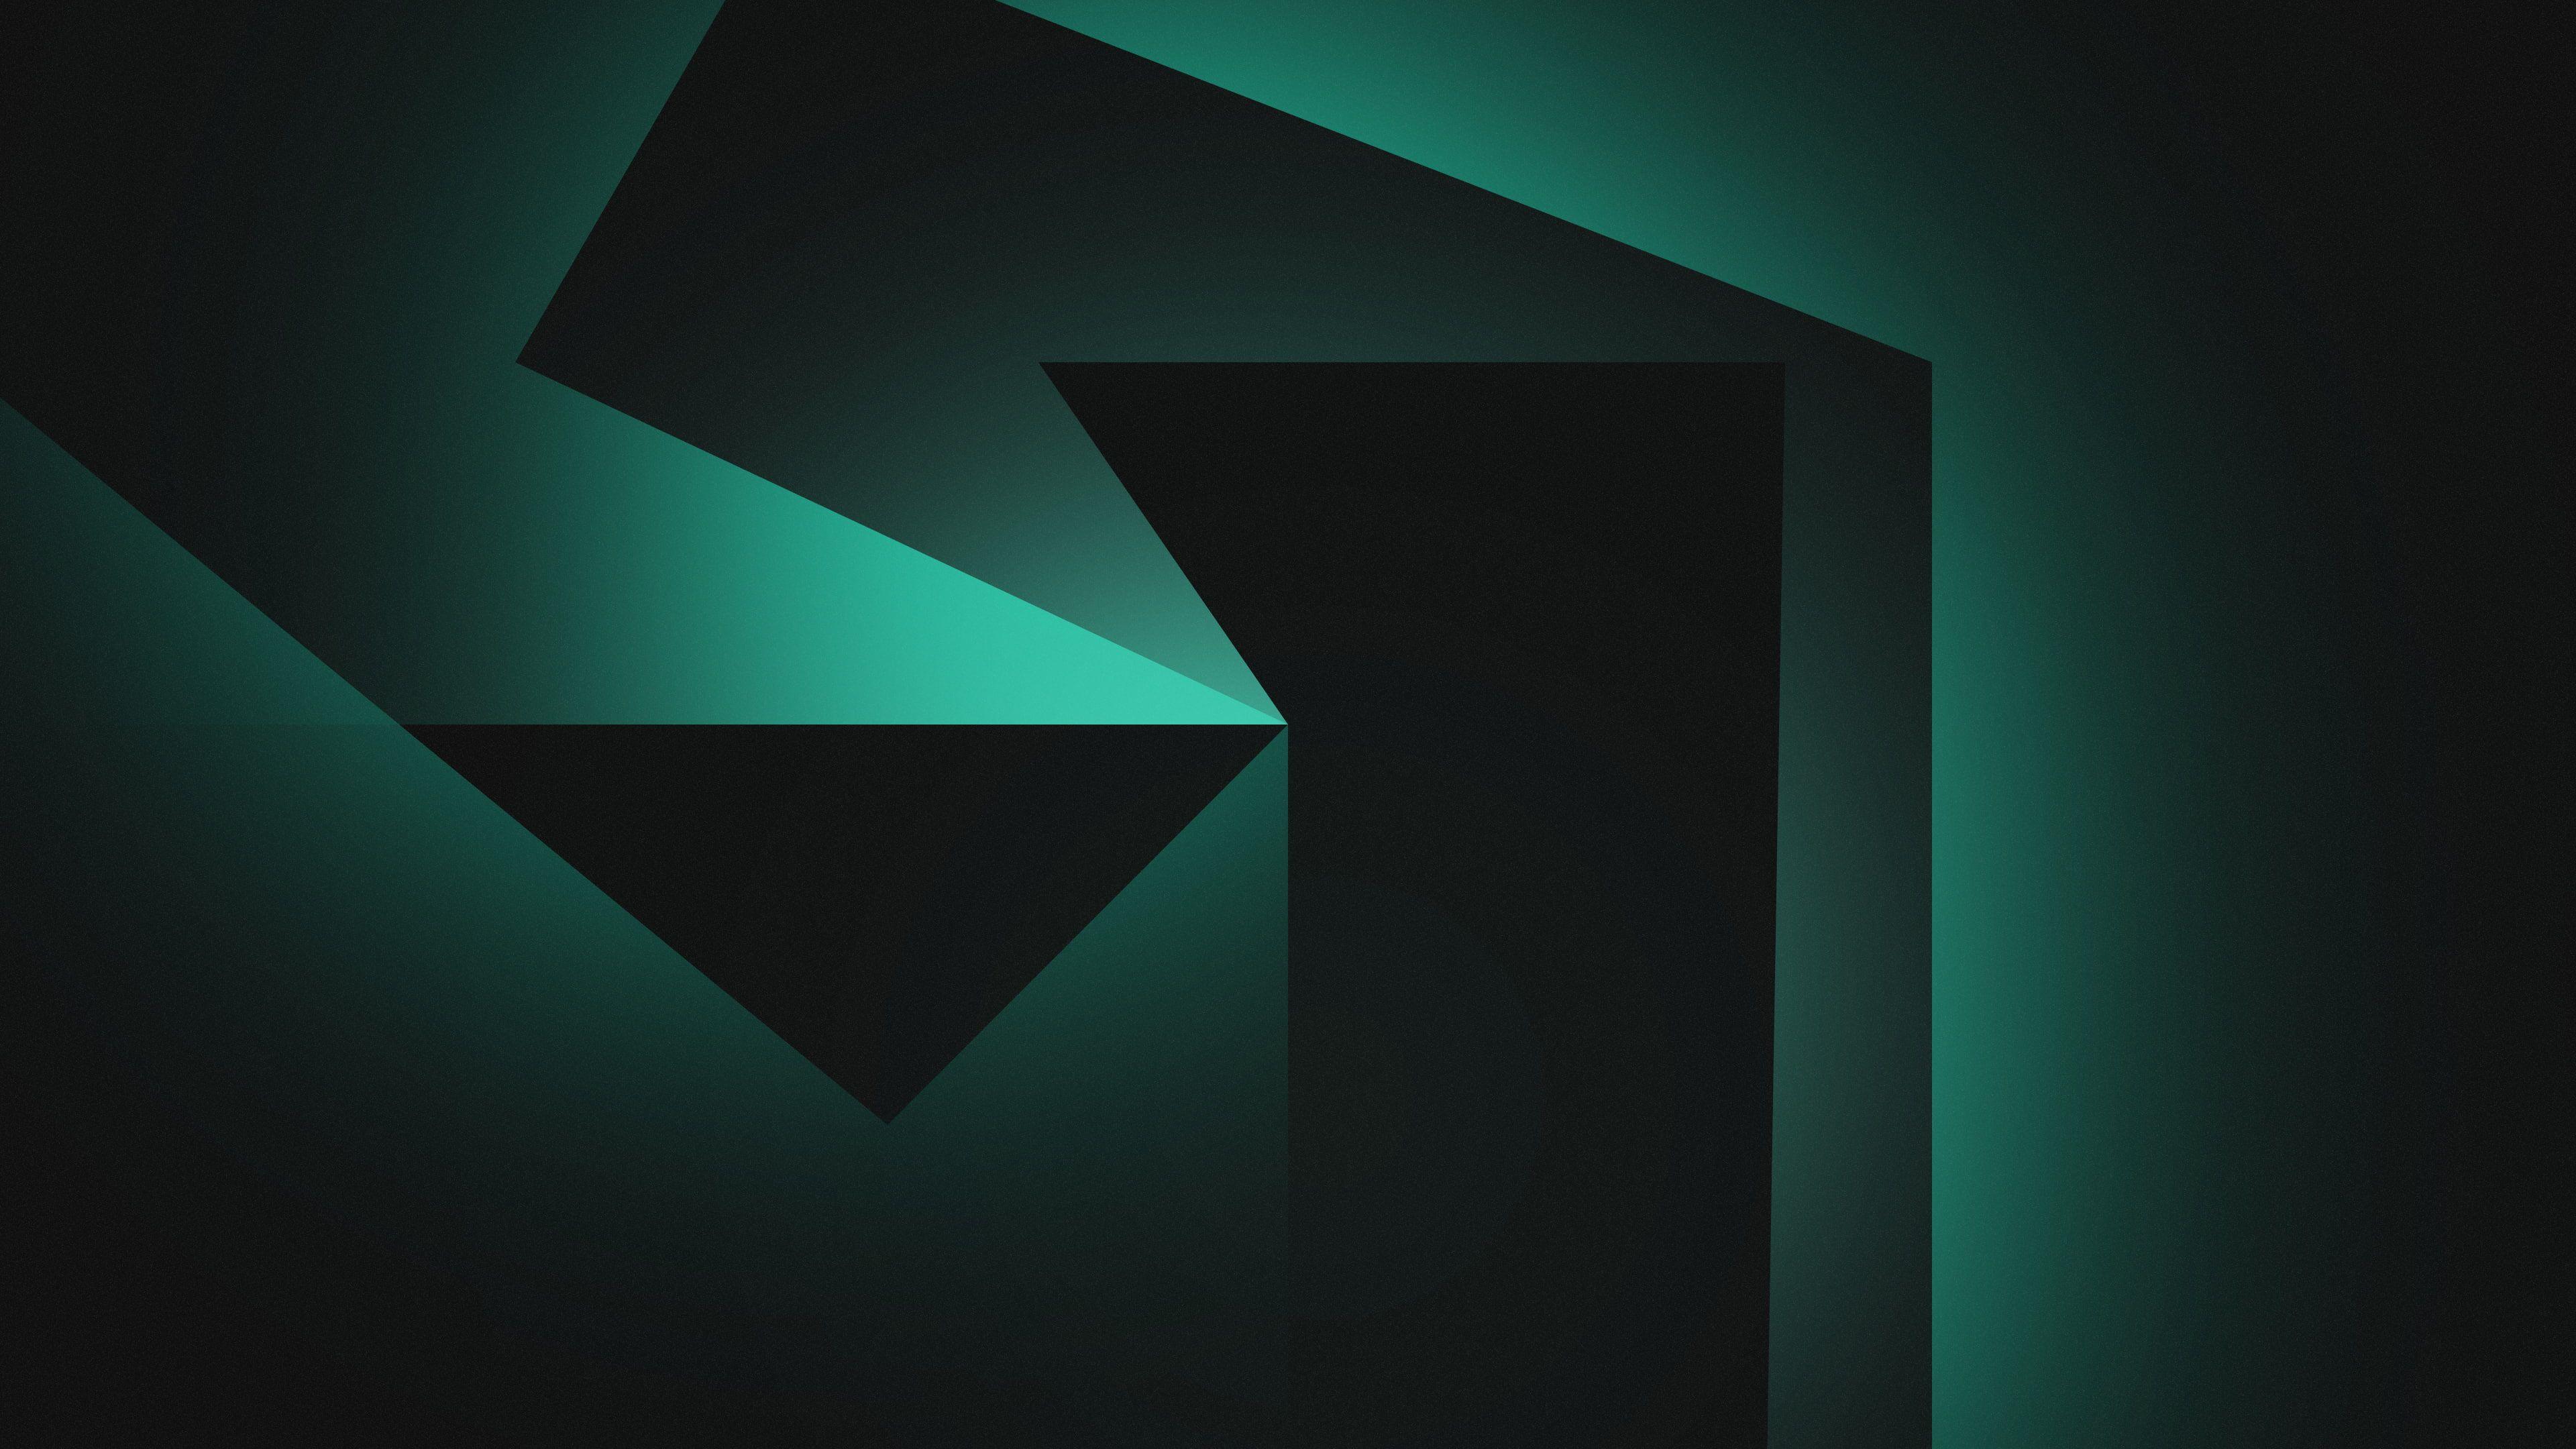 Shapes Geometric Dark Background Gradient Green 4k Black 4k Wallpaper Hdwallpaper Desktop In 2020 Dark Backgrounds Geometric Wallpaper